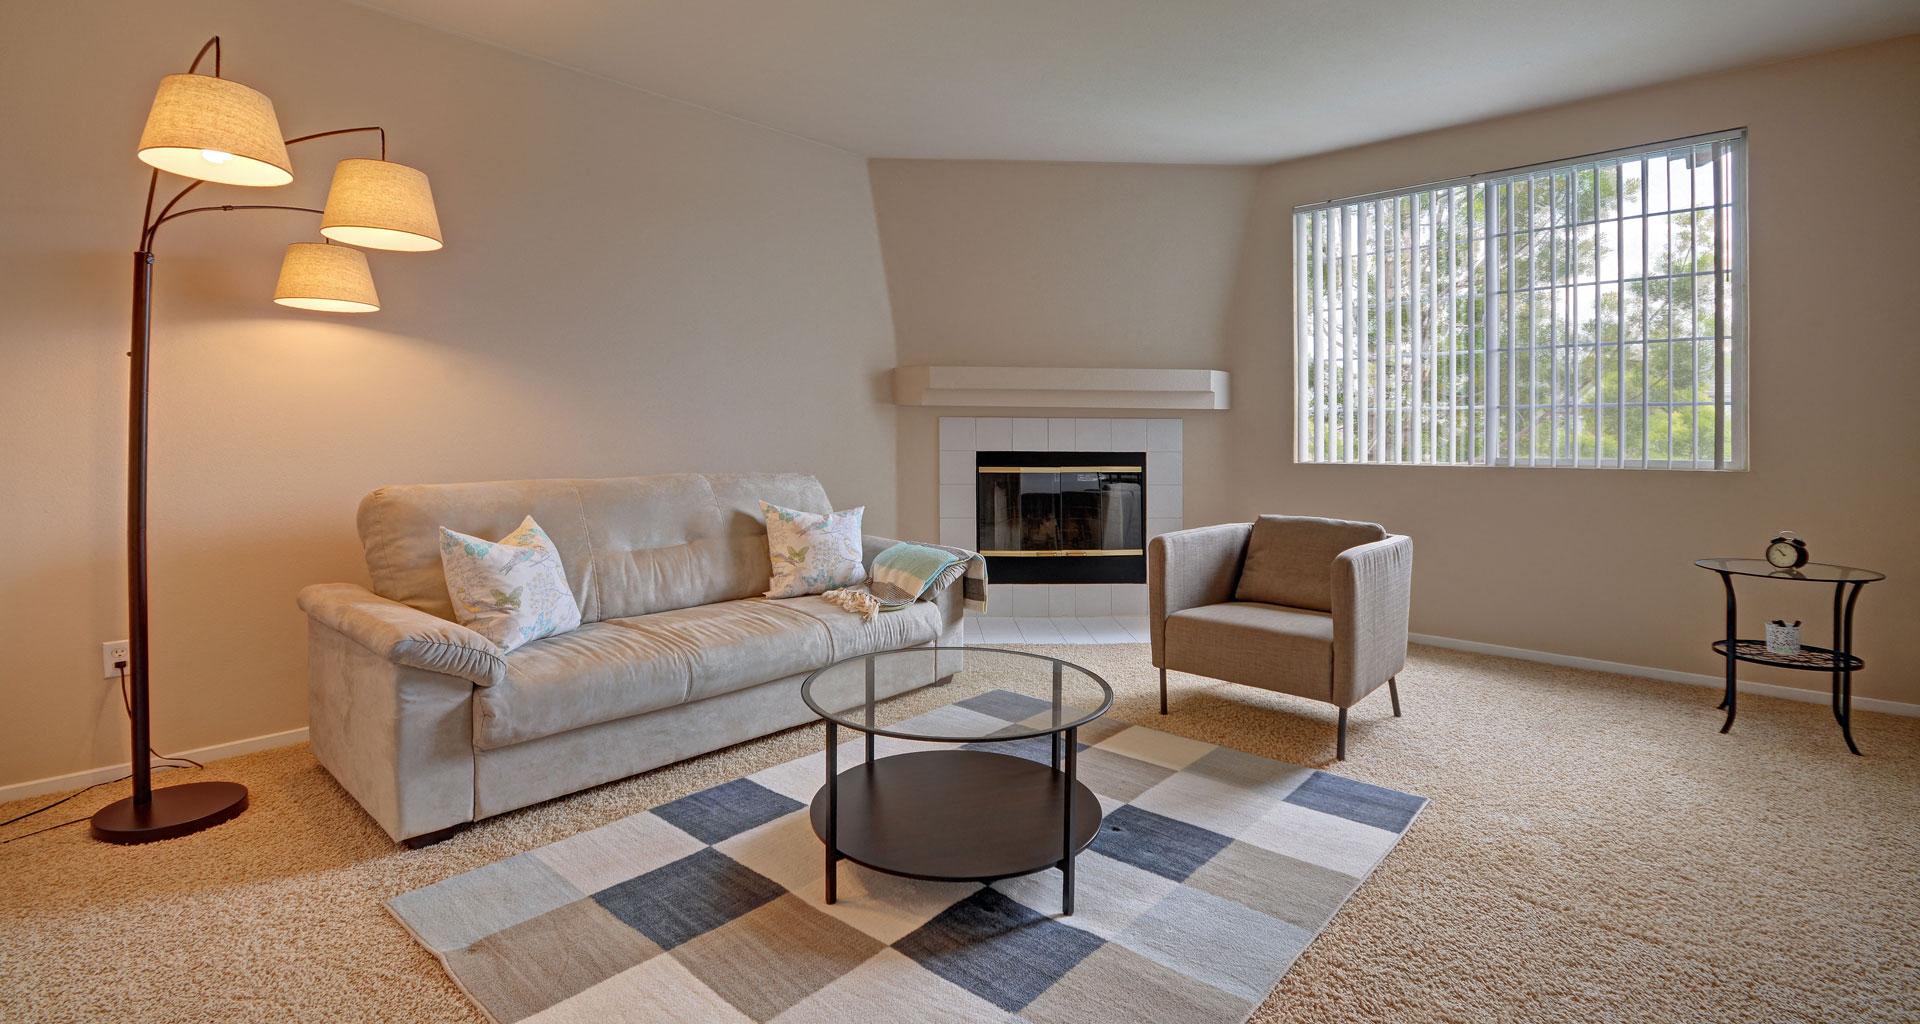 Pavona Apartments, 760 N. 7th Street, San Jose, CA, 95112 Has